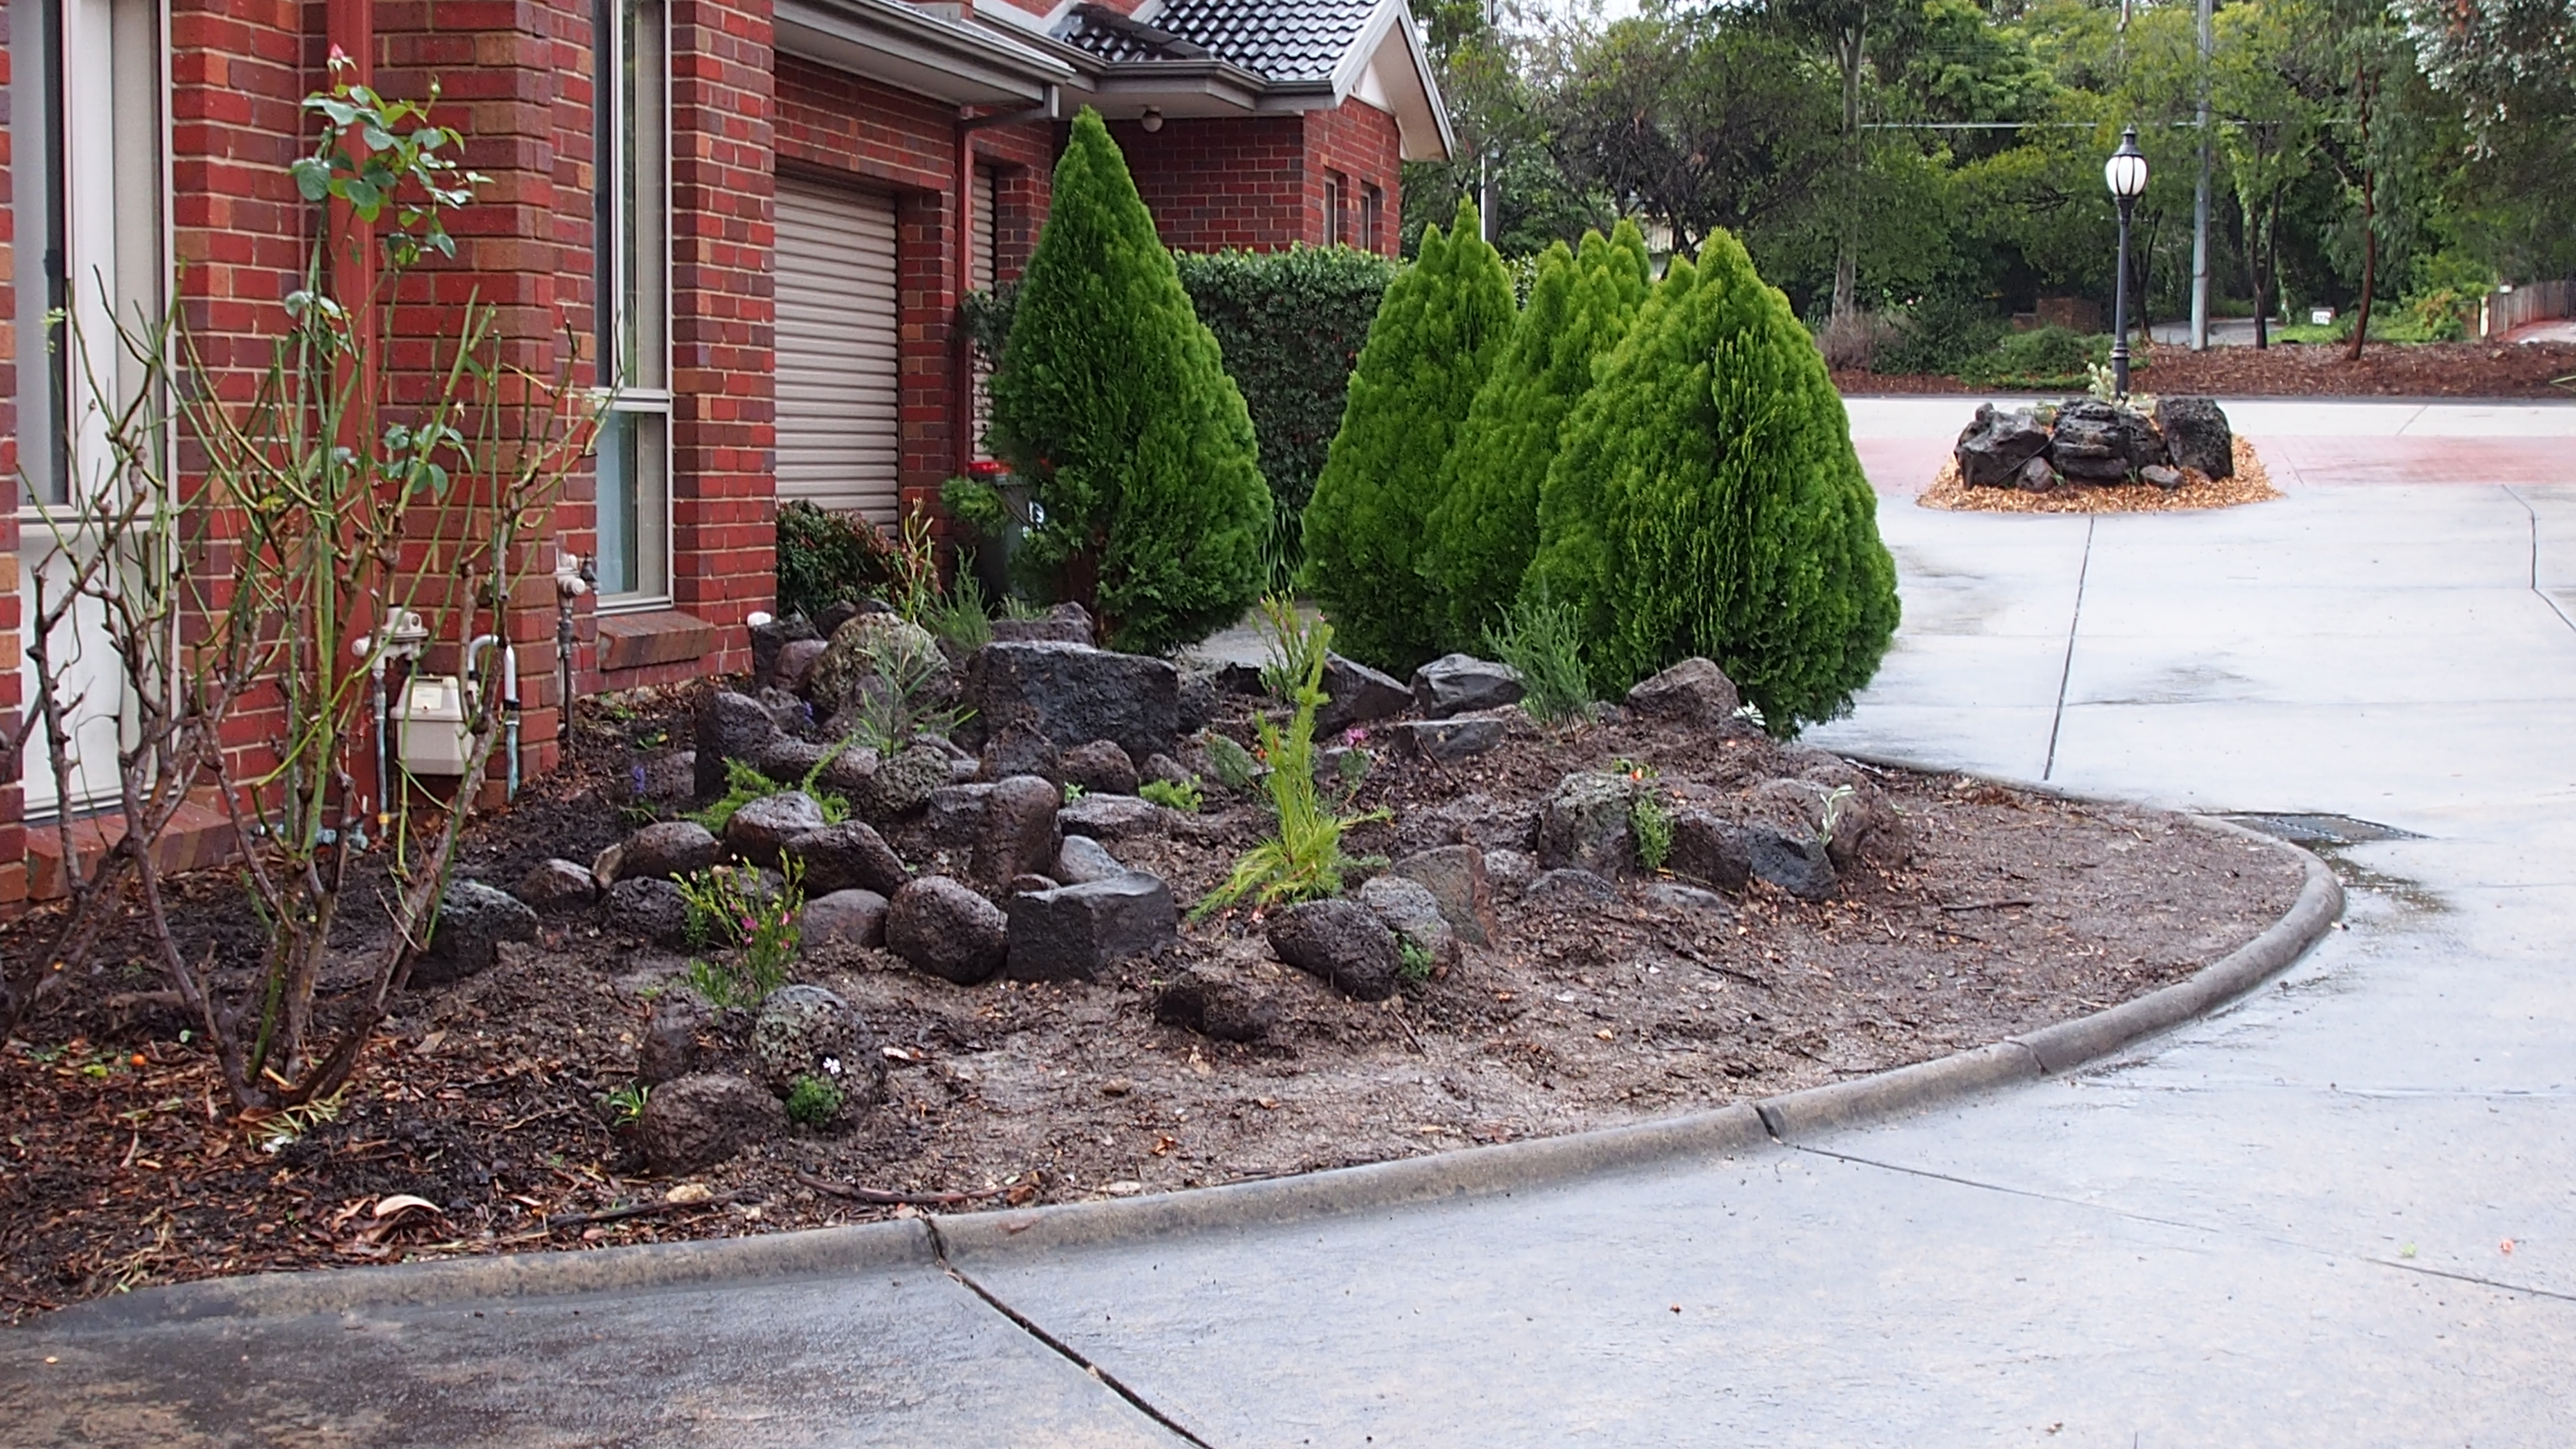 Immature circular rockery garden